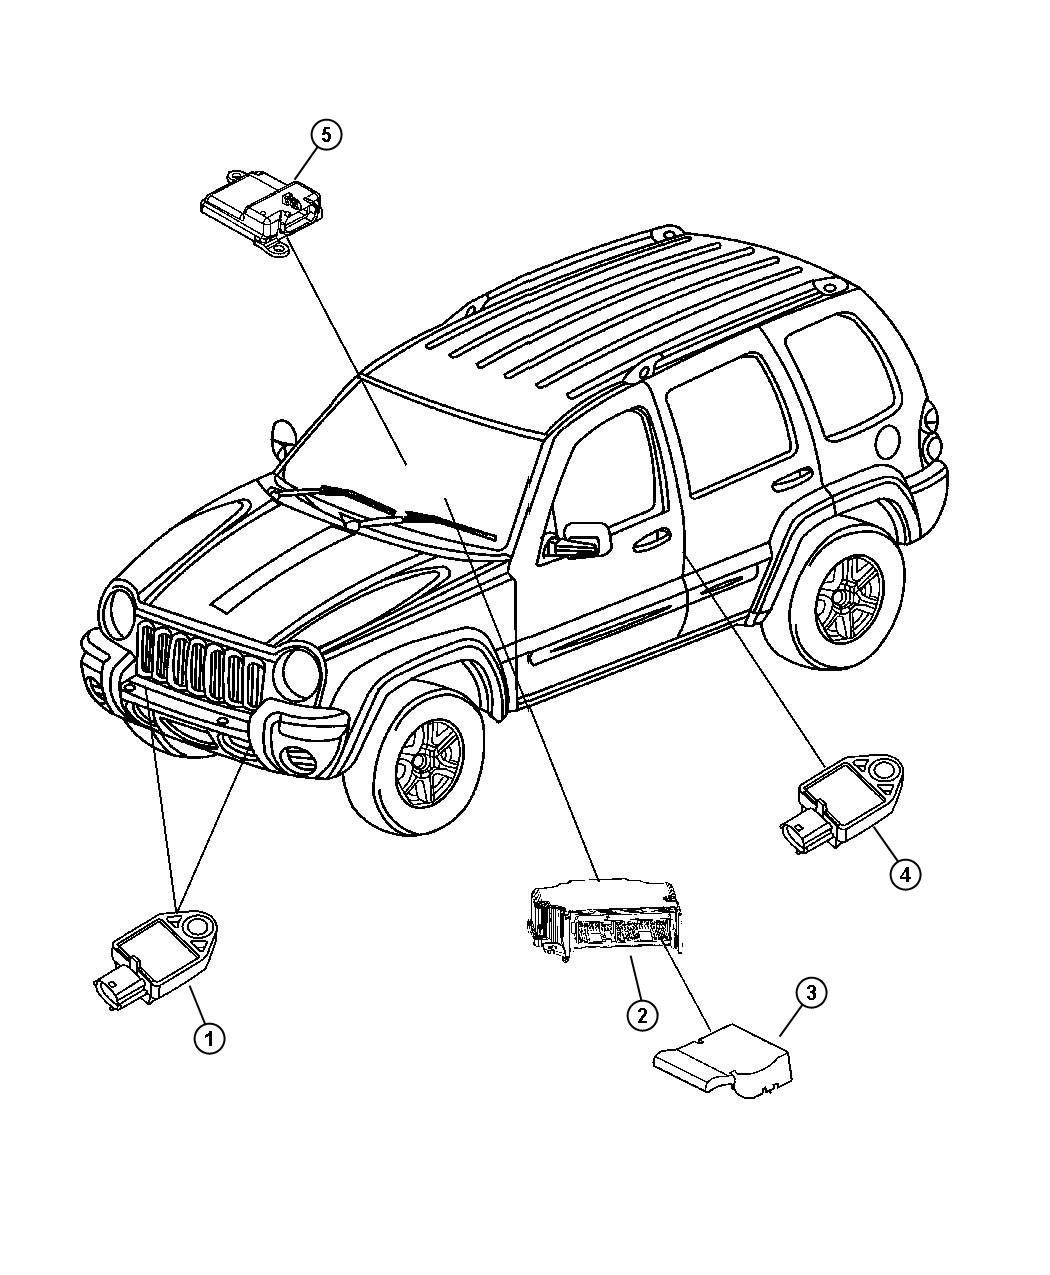 2000 Jeep Cherokee Wiring Diagram 2002 Jeep Liberty Belt Diagram 2007